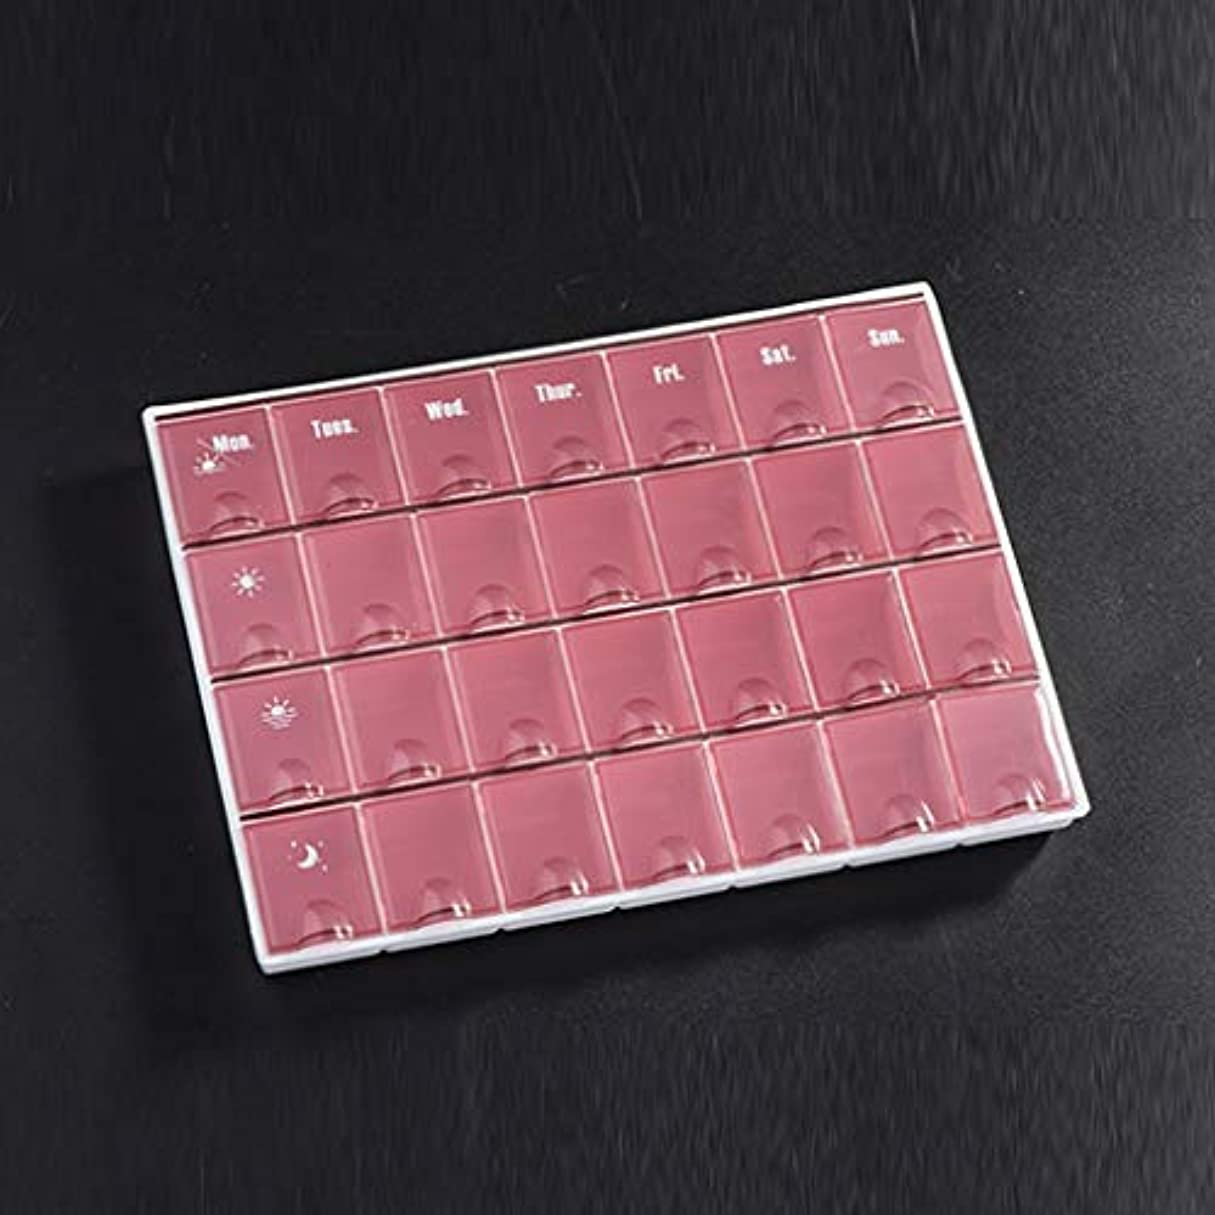 LWWOZL 家庭用薬毎週薬箱大容量を毎日7日間調剤朝、中、晩、28、家庭薬保管箱 (Color : Brown, Size : 21.5cm×15.8cm×2.1cm)